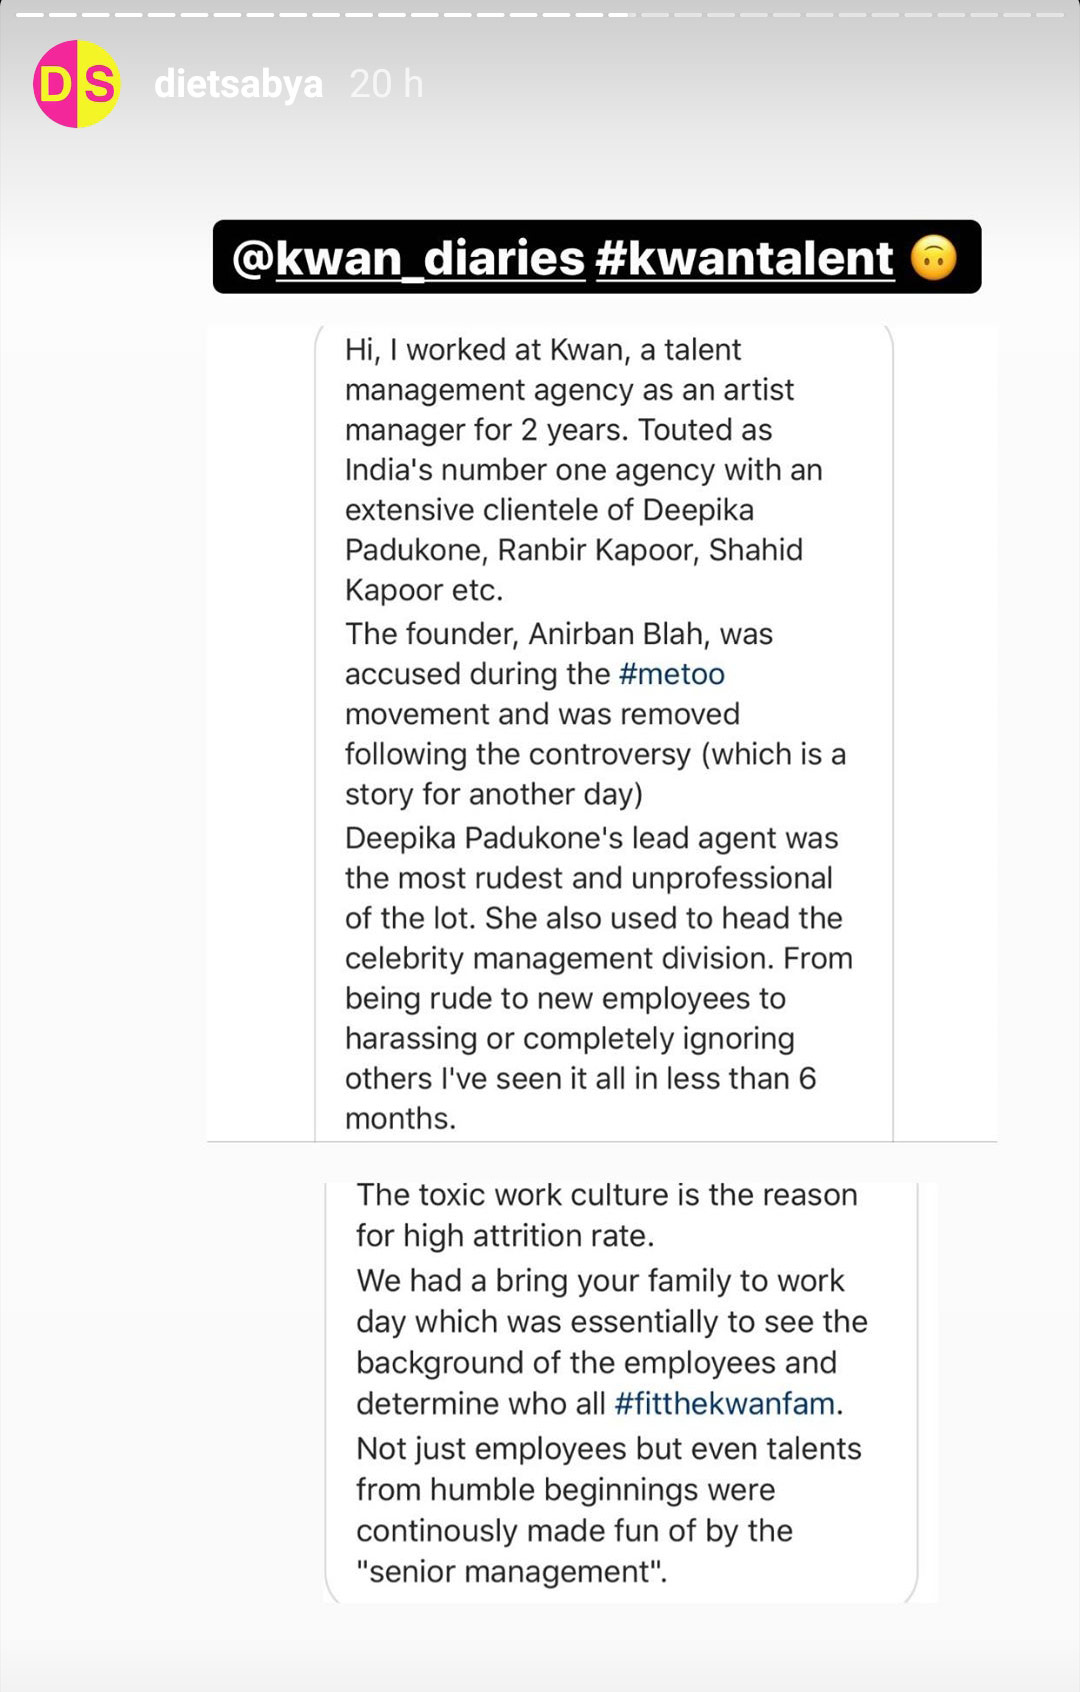 Diet Sabya Calls Out Deepika Padukone & Ranbir Kapoor's Talent Agency For Harassment and Toxic Work Environment(Pic credit: dietsabya/Instagram)